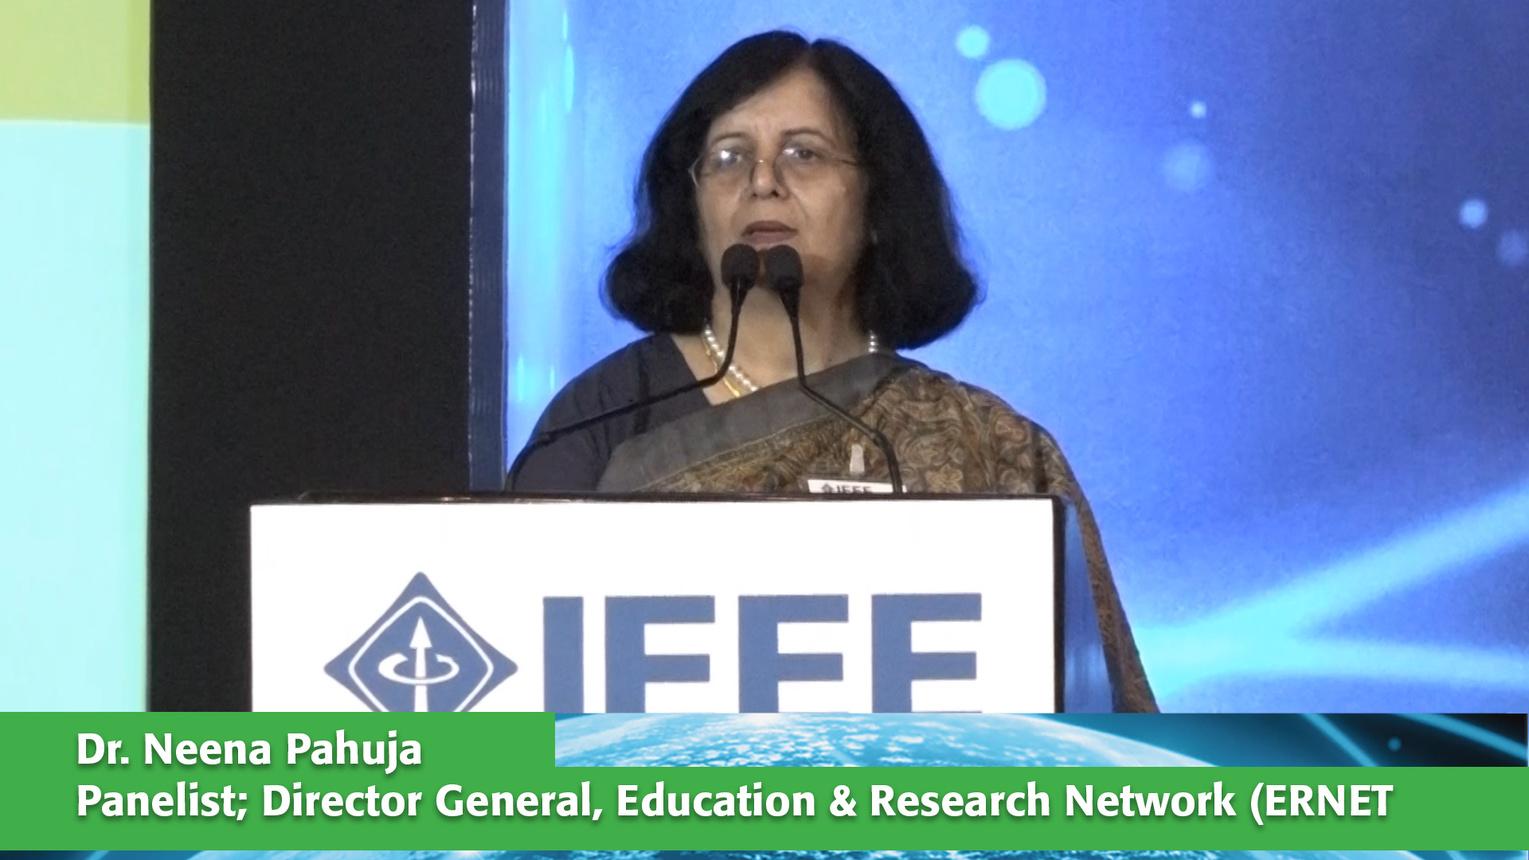 Panelist: Dr. Neena Pahuja - ETAP Delhi 2016